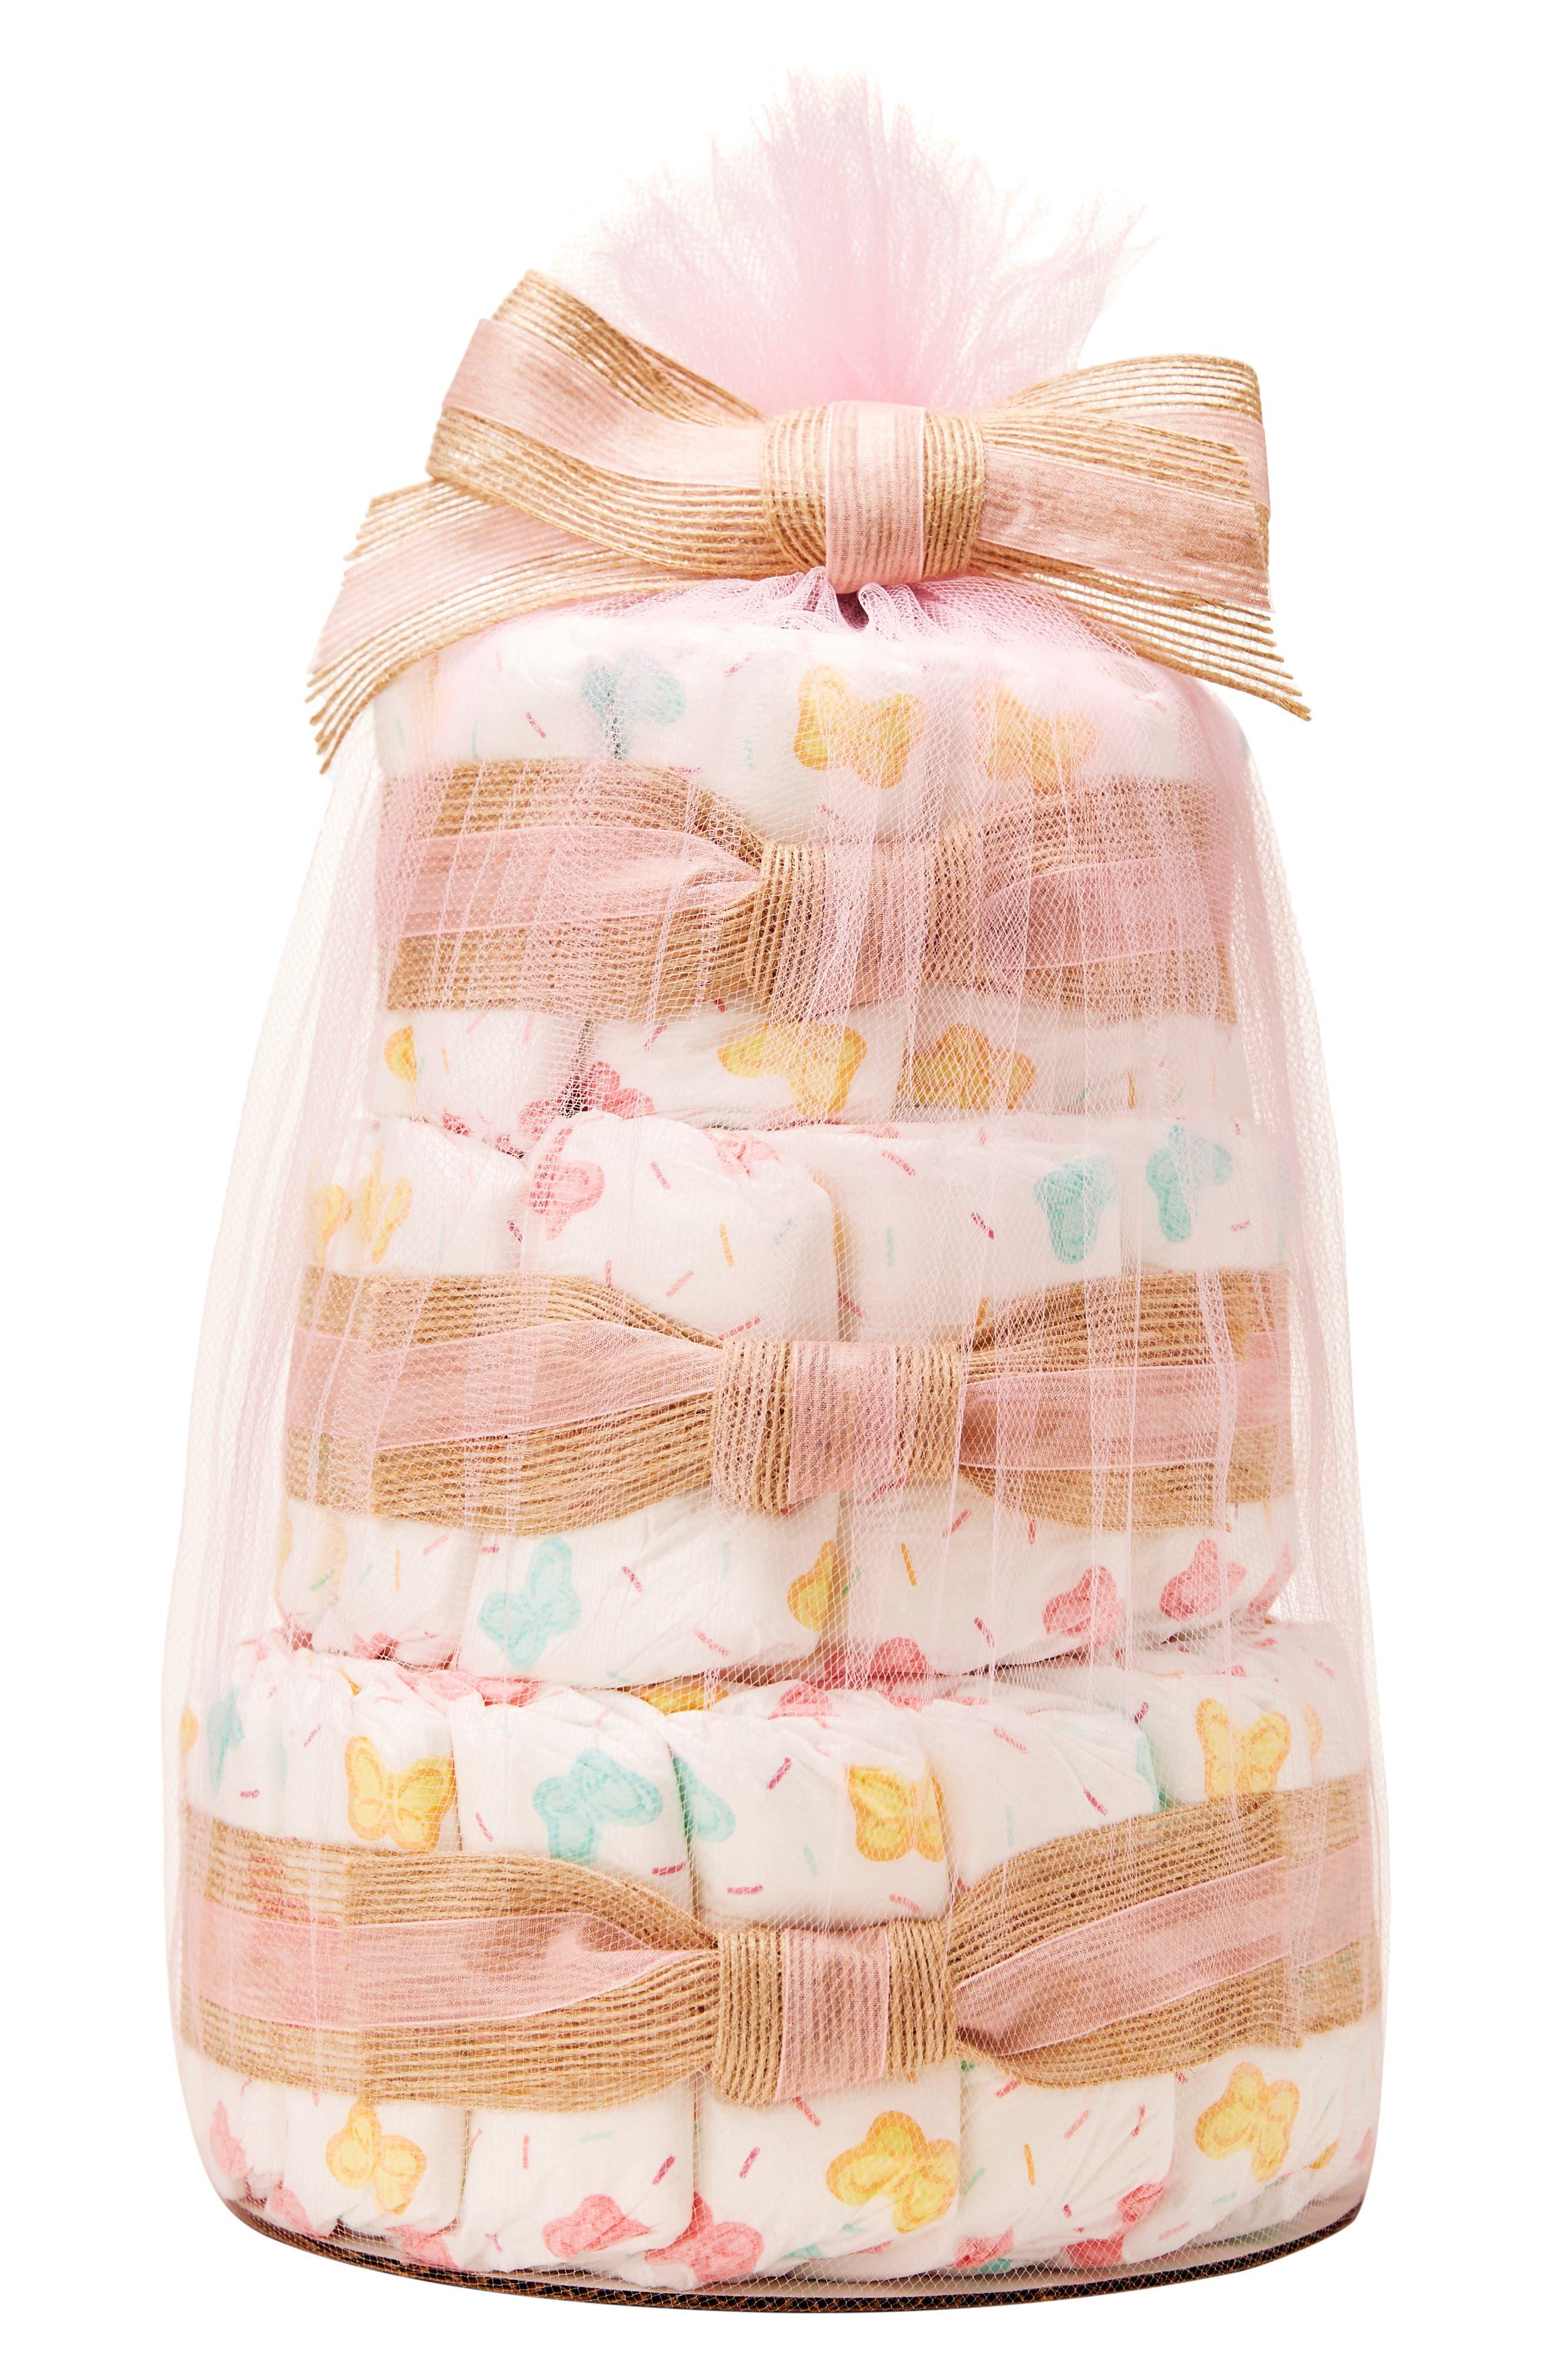 x Sugarfina Sweet Thing Mini Diaper Cake,                             Main thumbnail 1, color,                             104